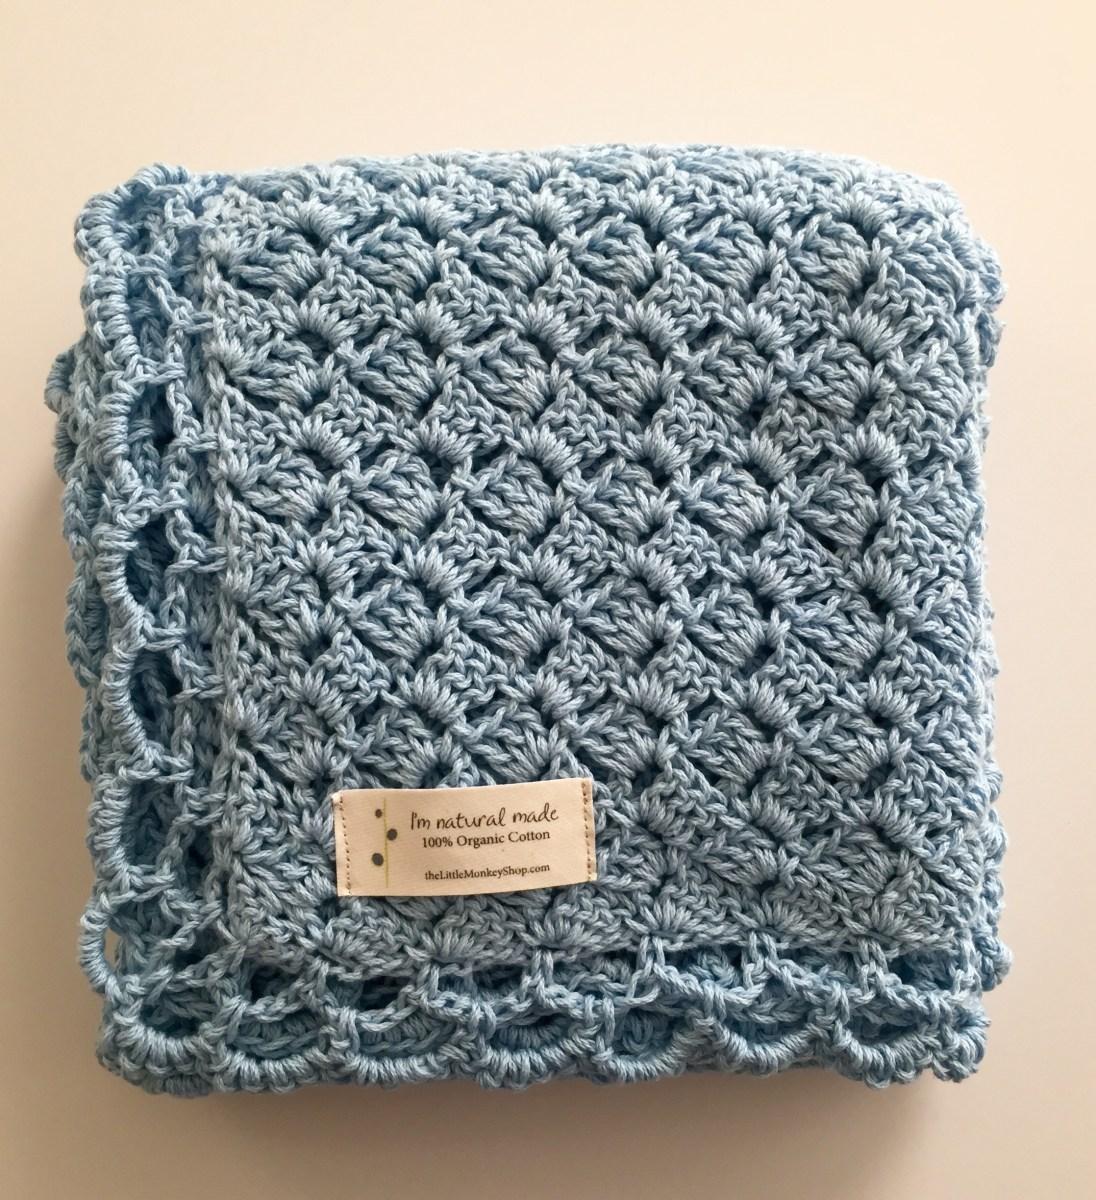 Blanket Crochet Pattern Free to Get You Warmer at Night Stitch Ba Blanket Free Crochet Pattern For Patterns Beginners